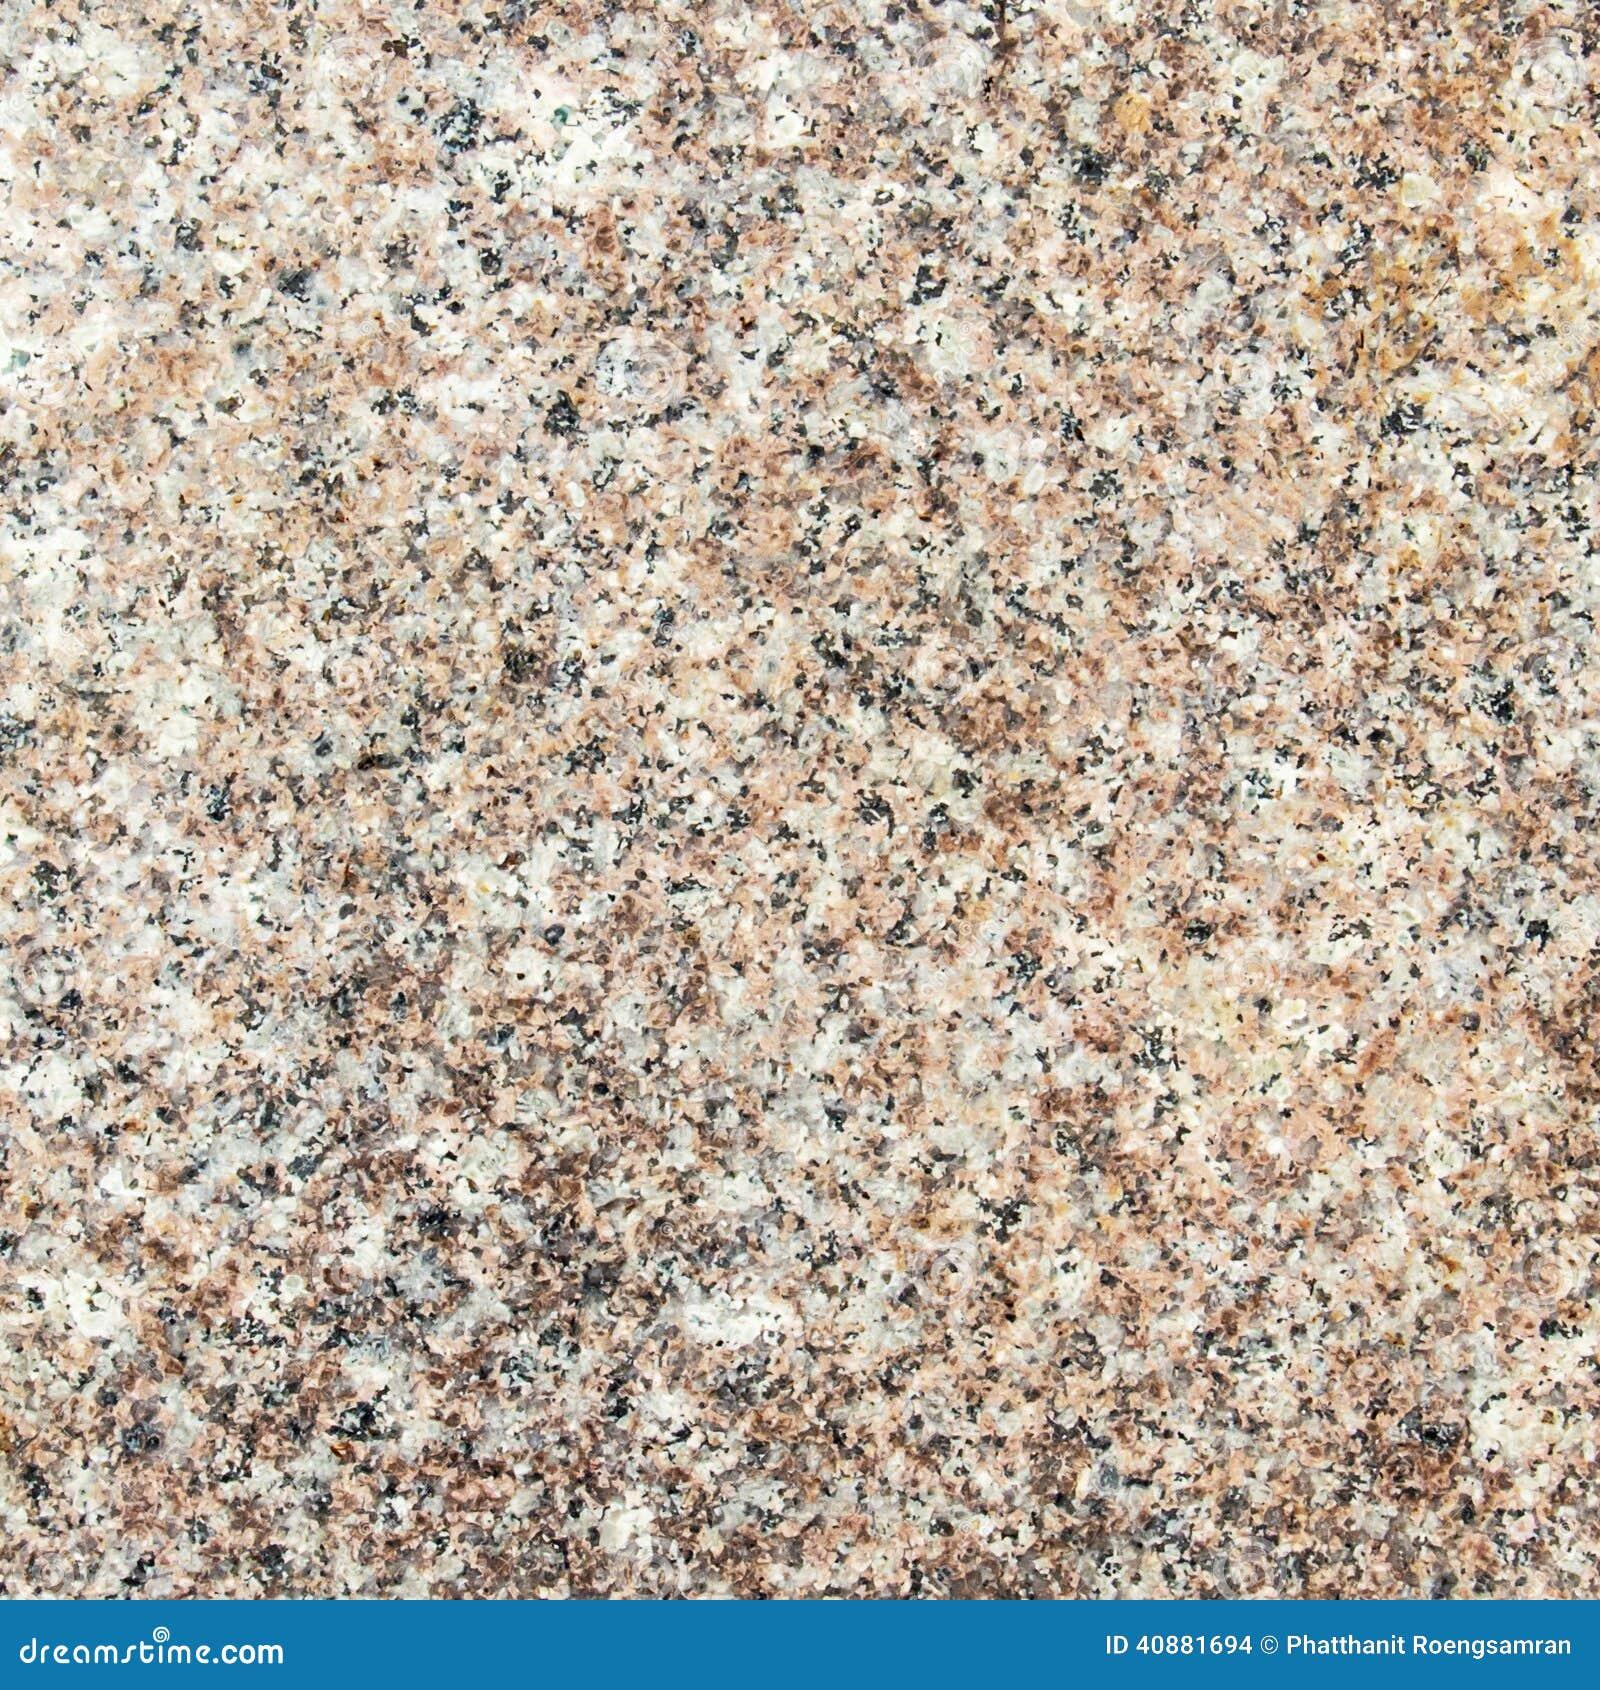 White Granite Background : Polished white and brown grain granite as background stock